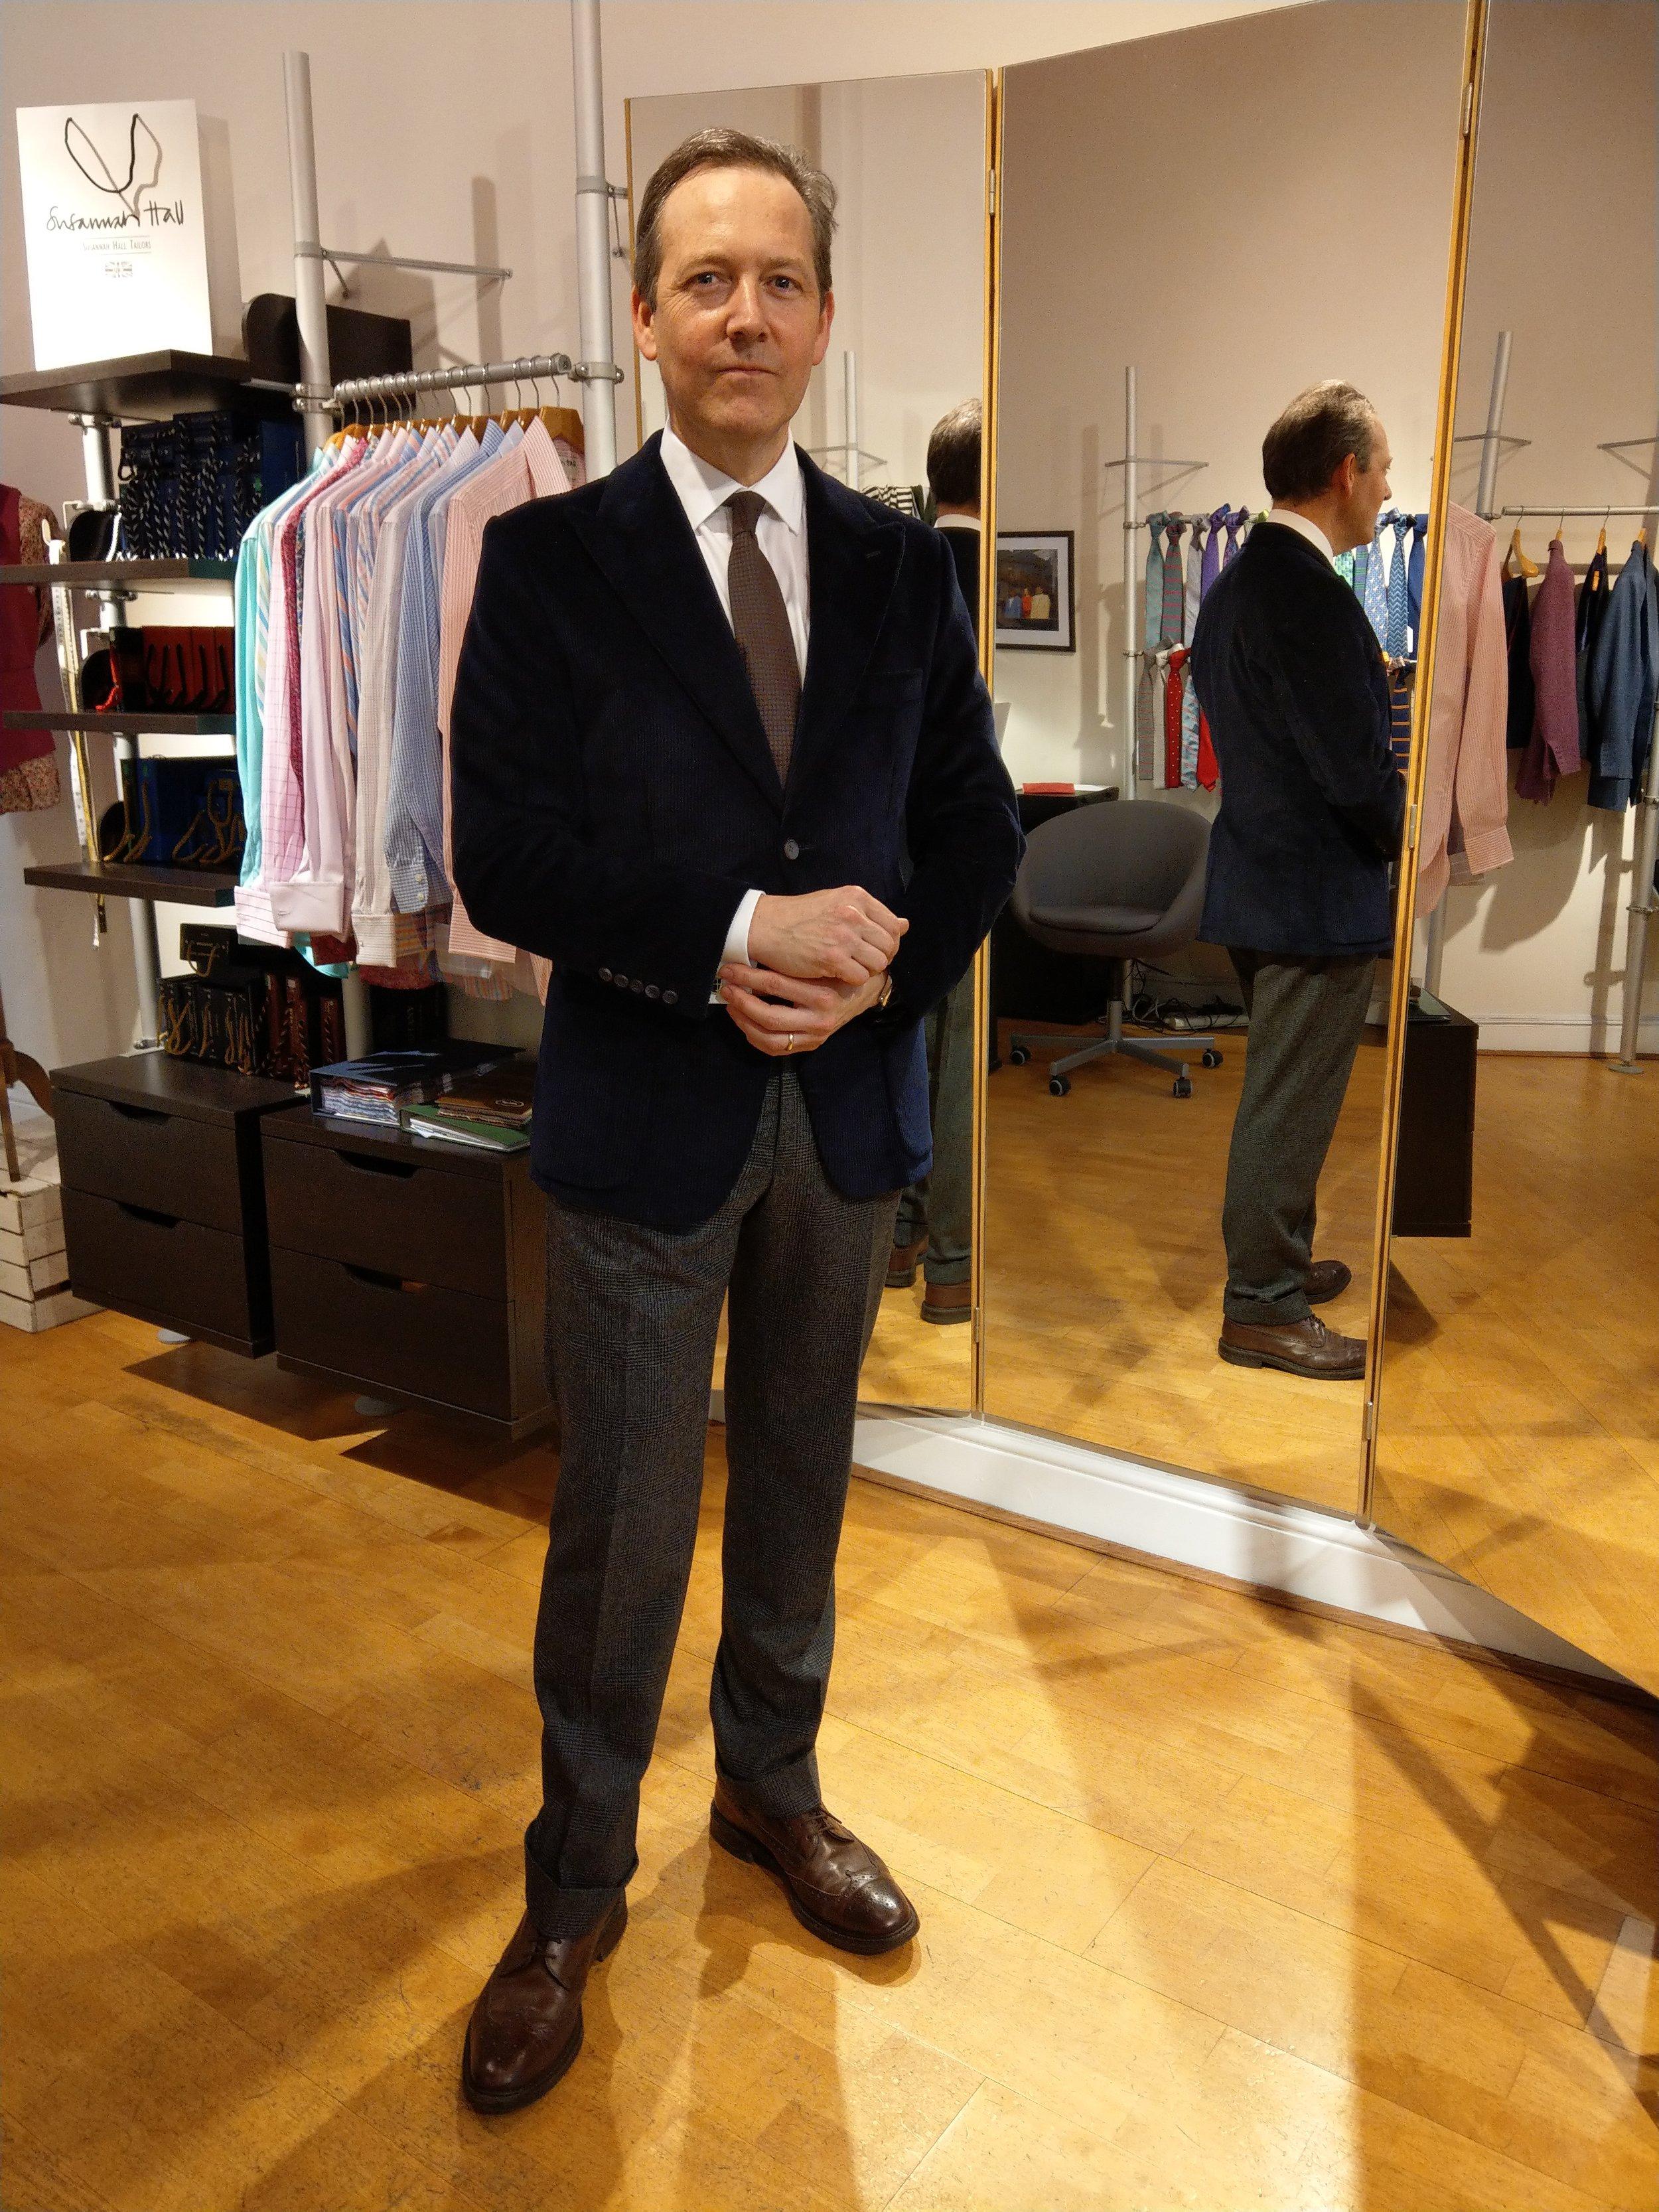 susannah-hall-tailors-bespoke-corduroy-jacket-flannel-trouers-harrisons-made-uk-british.jpg